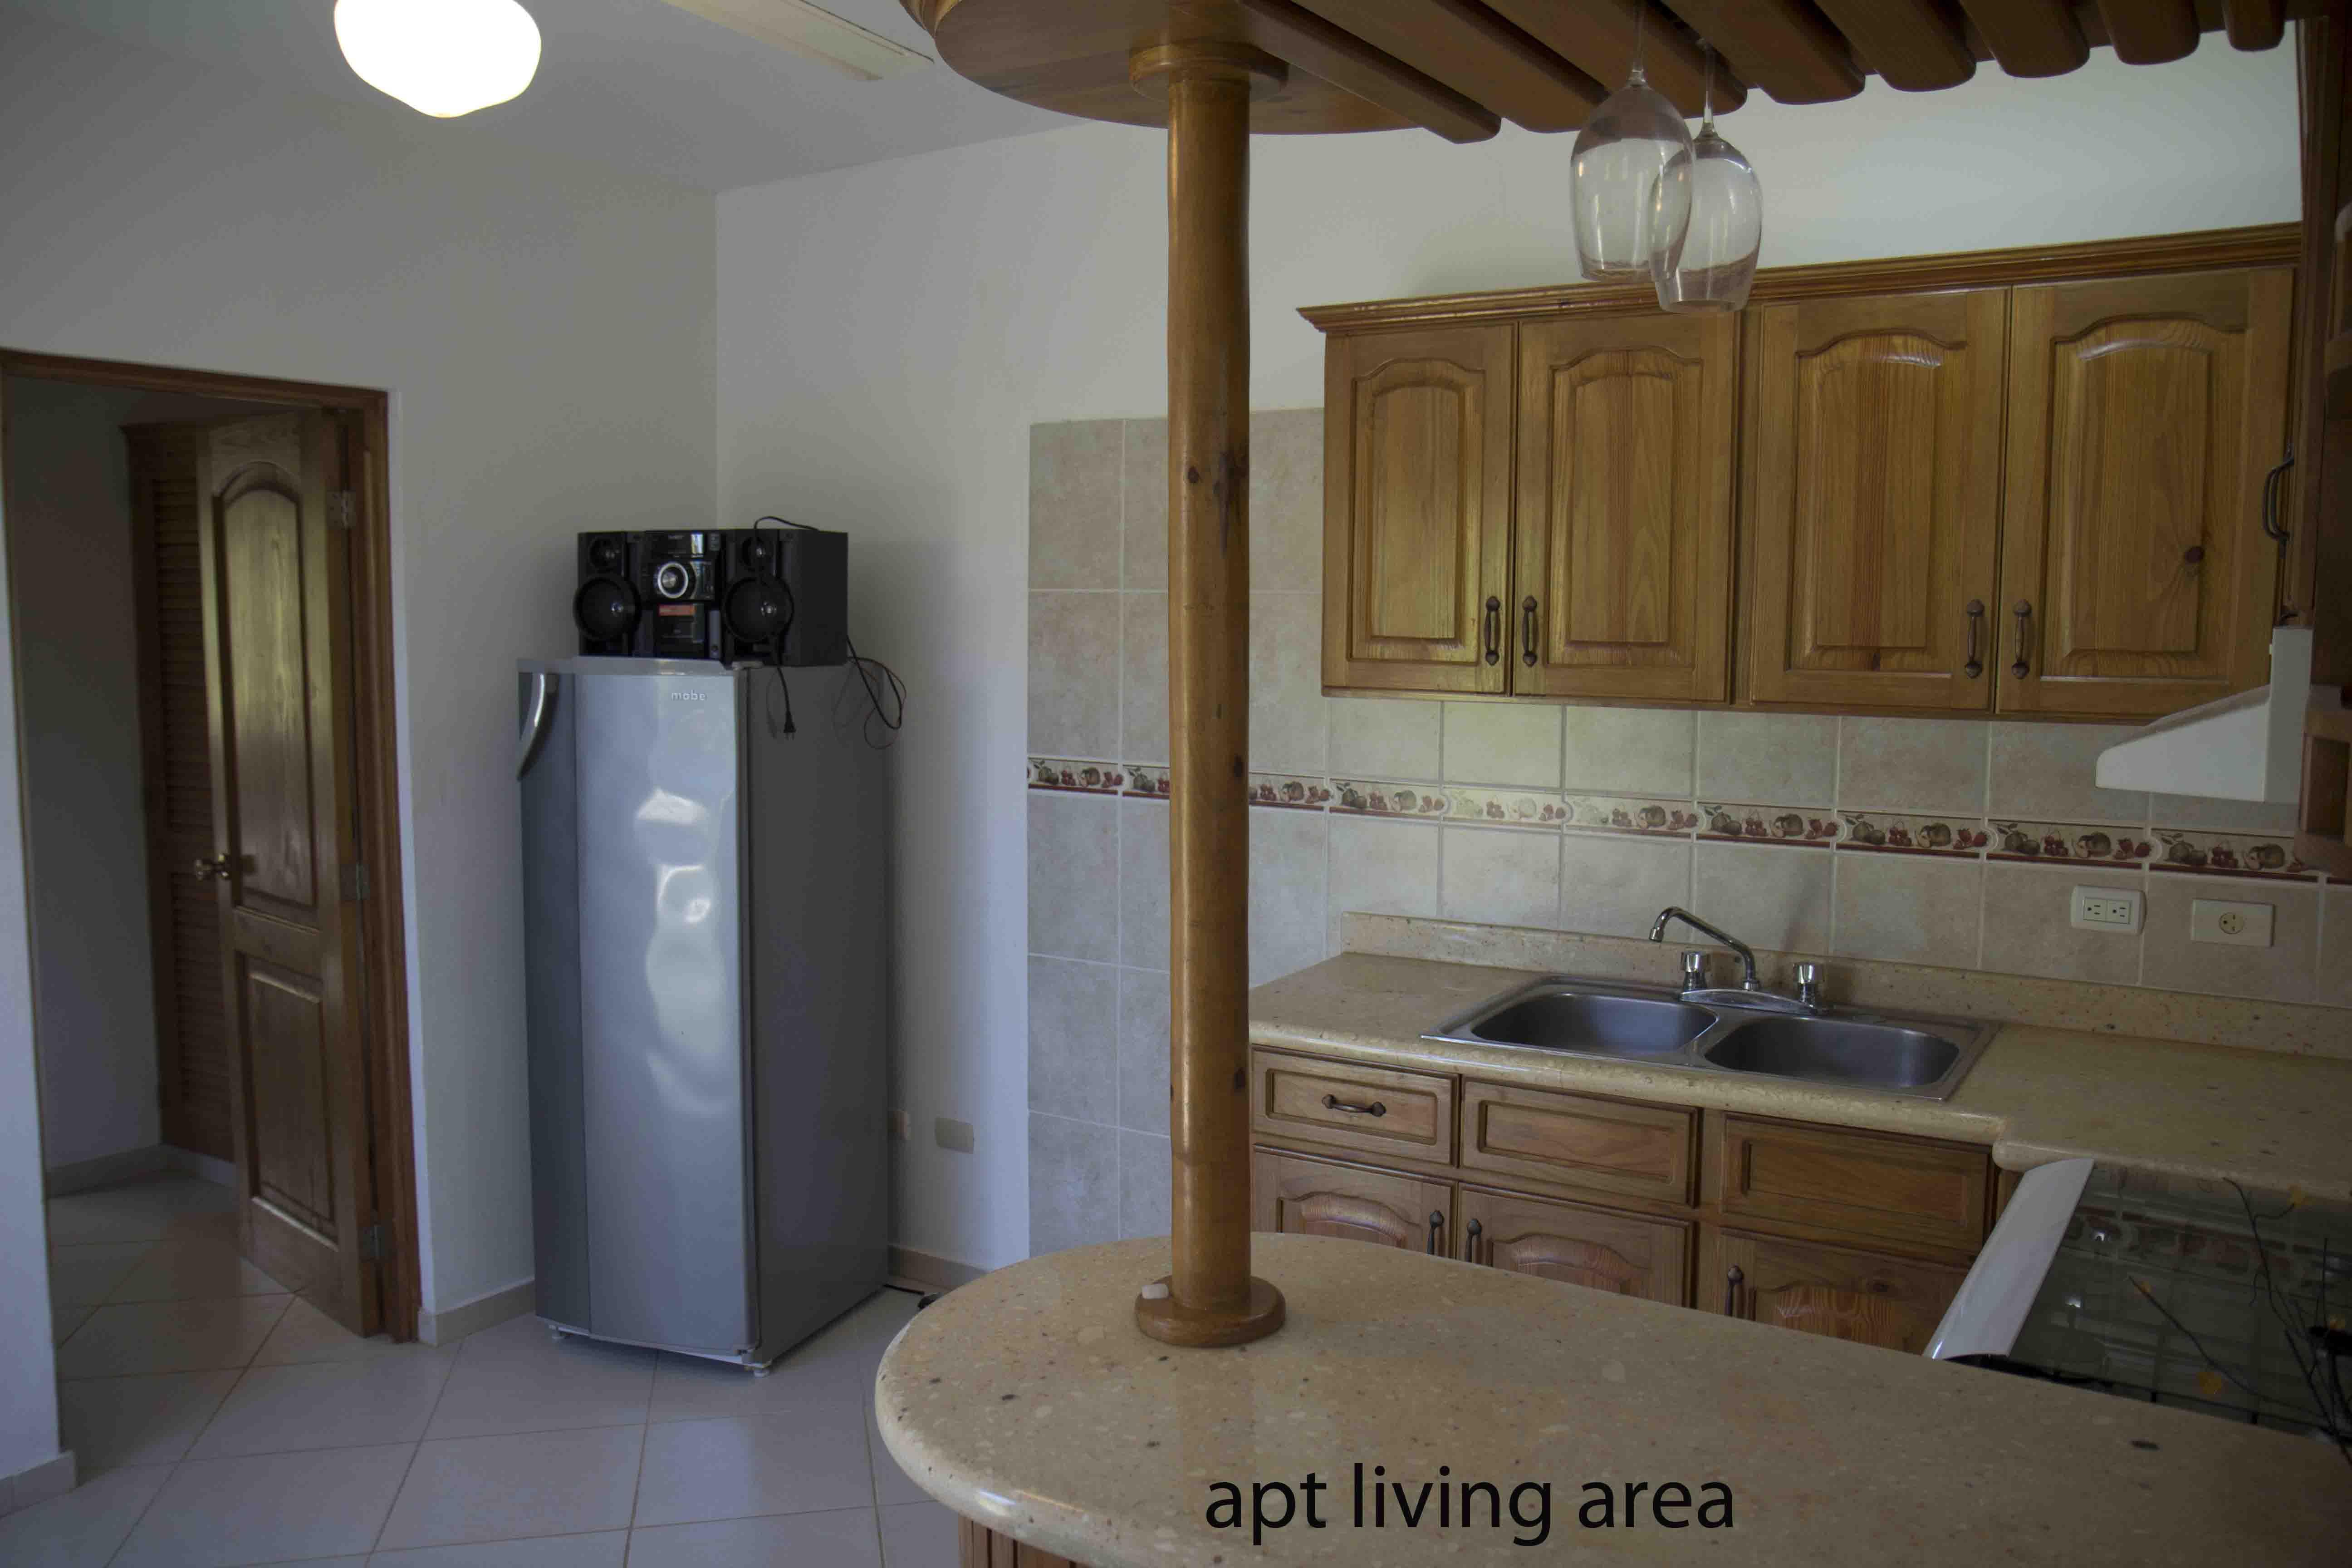 apt-living-area-2